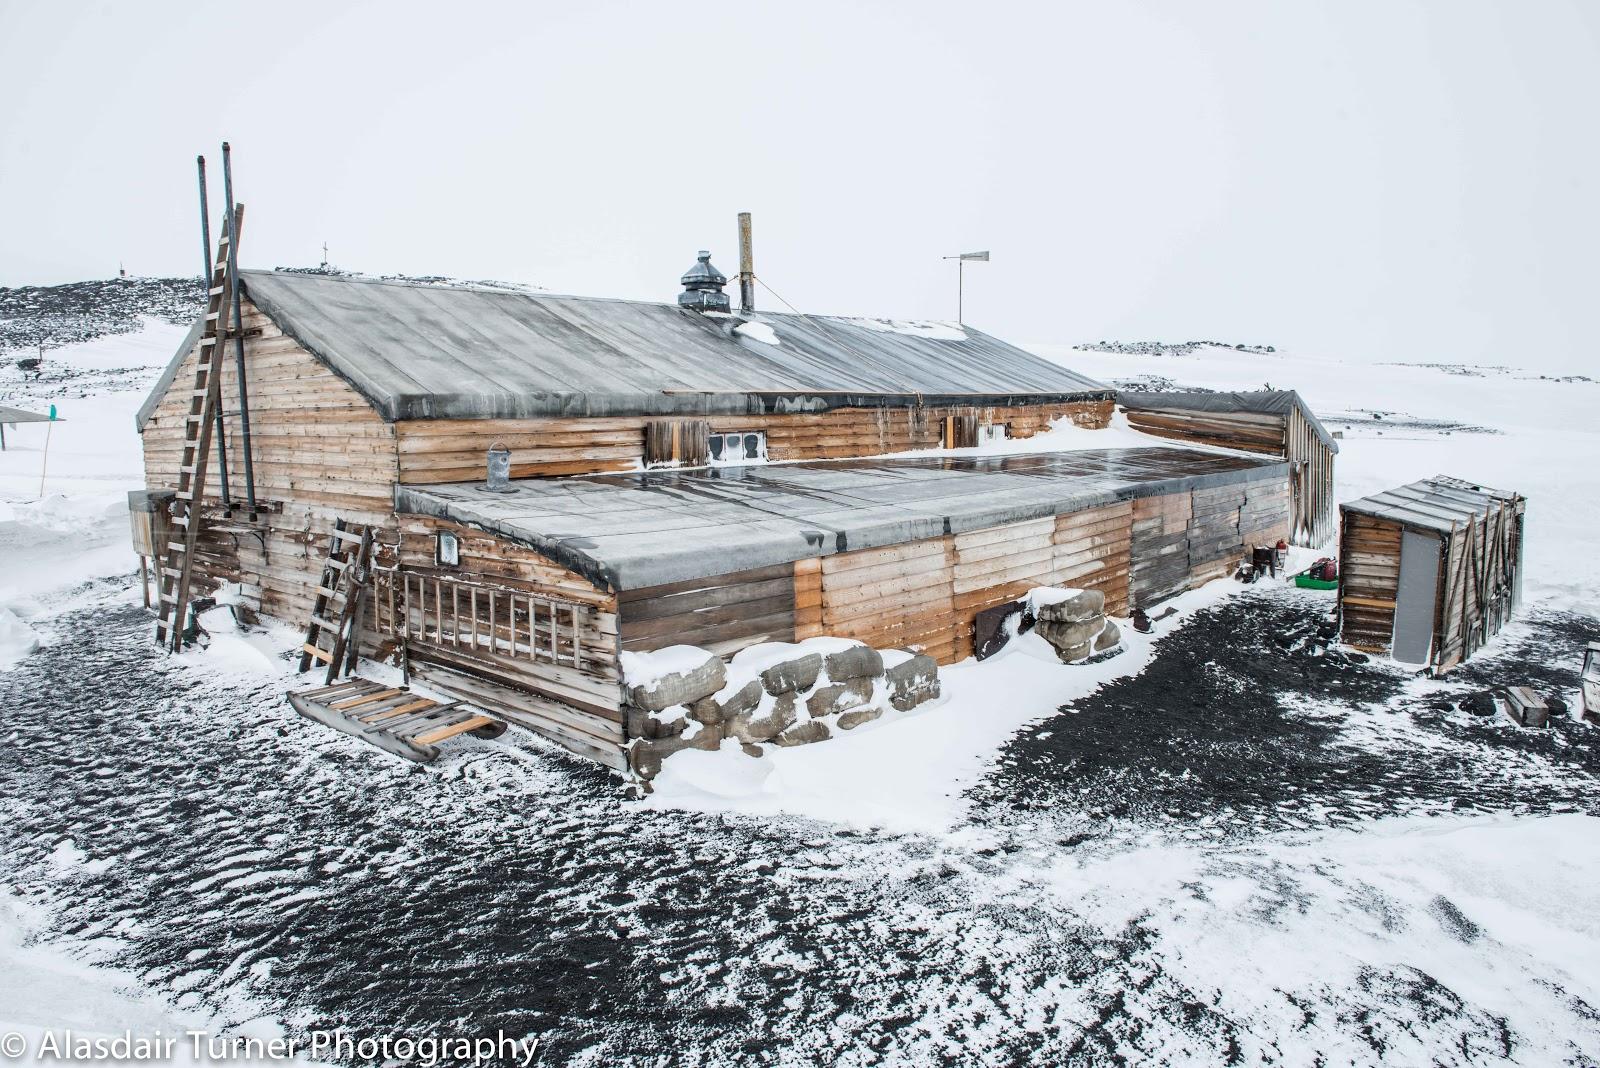 Looking south over Scott's Terra Nova hut.